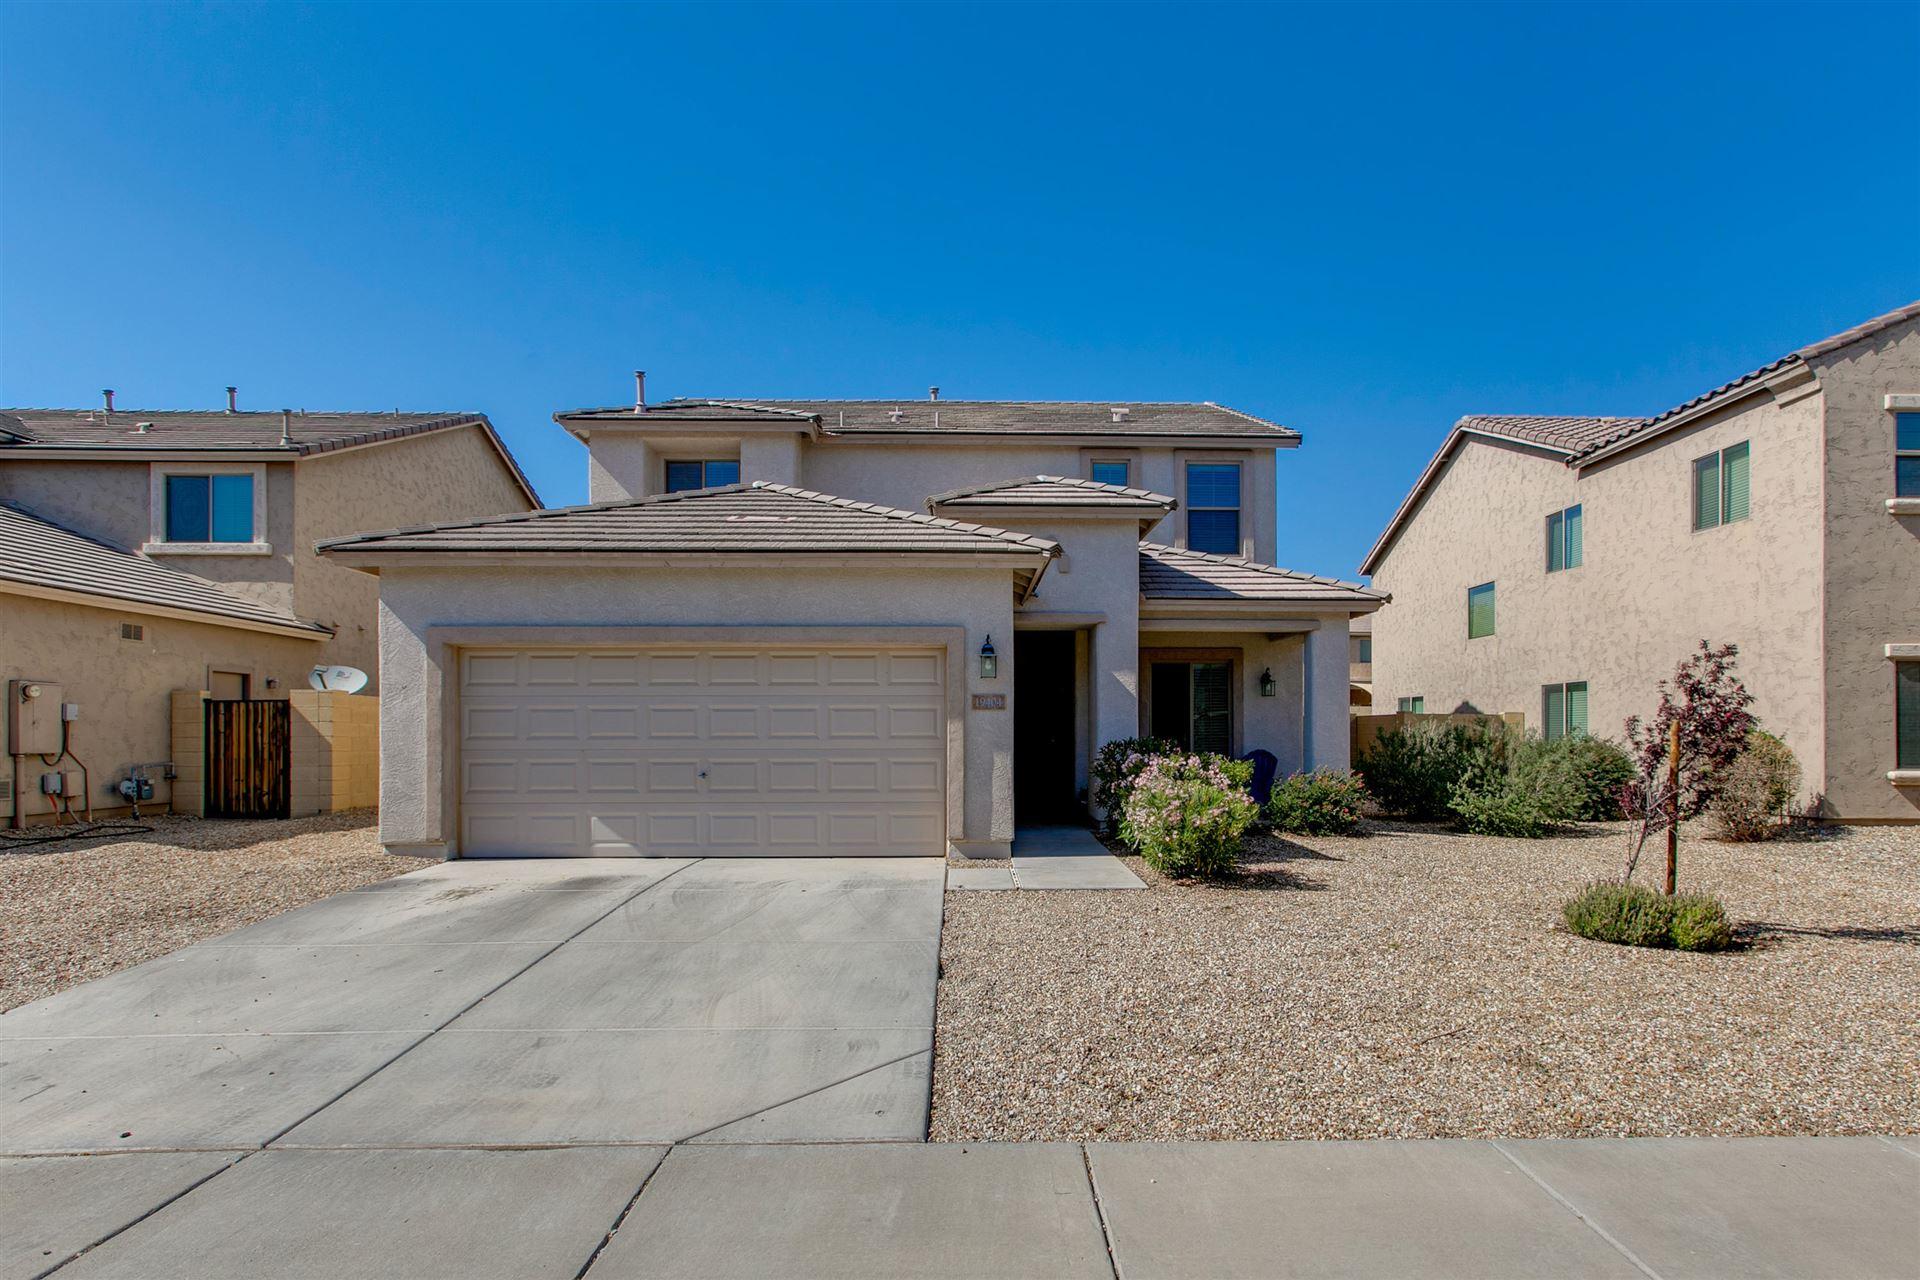 Photo of 19404 W MADISON Street, Buckeye, AZ 85326 (MLS # 6229682)